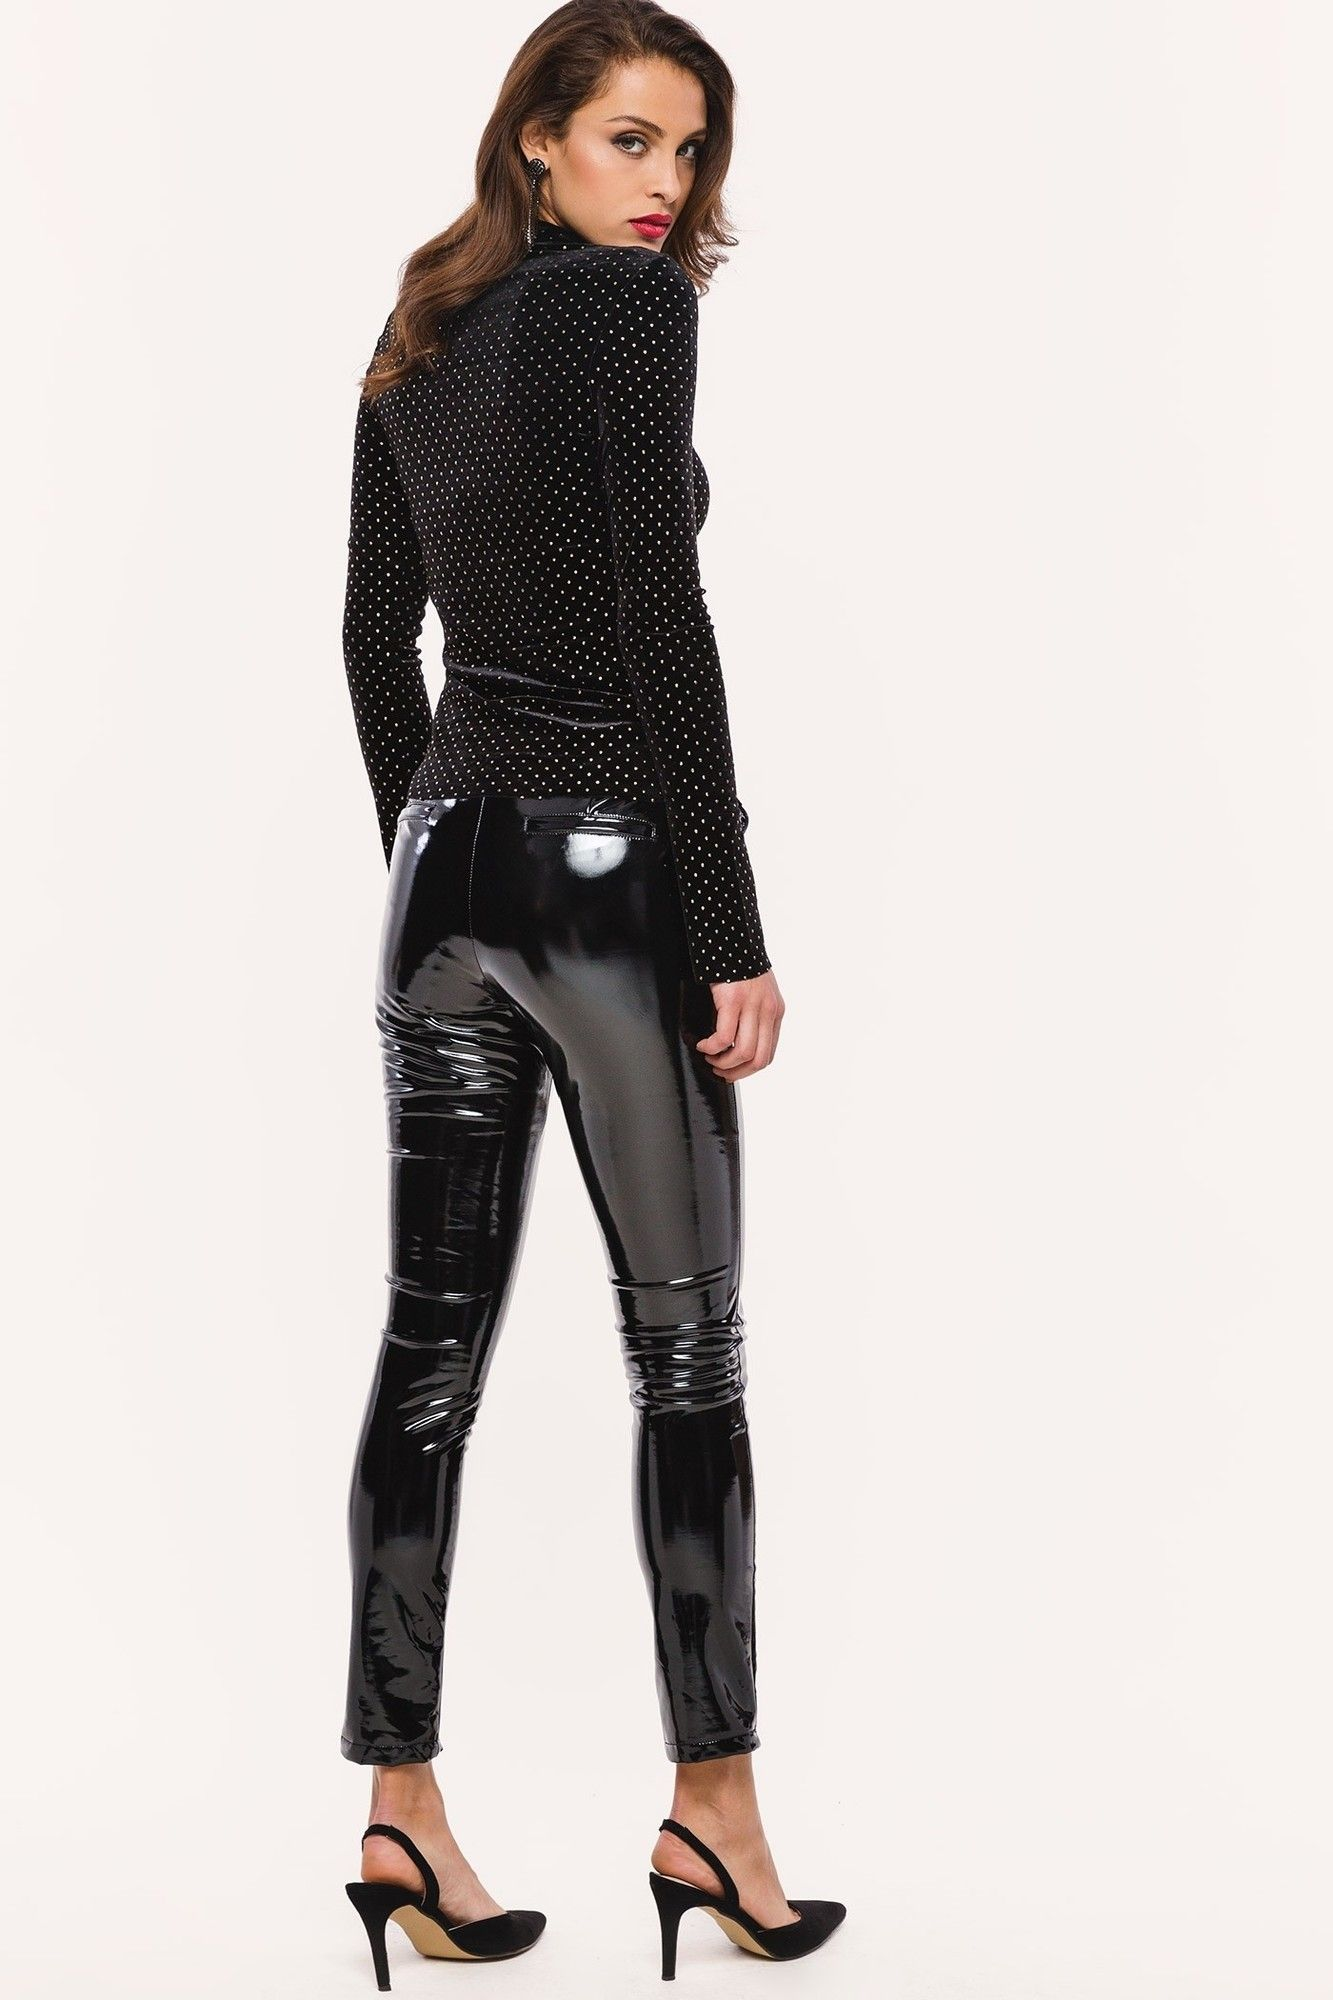 0cd9ac63 Loavies lakleer broek | Fashion Webshop LOAVIES | Sexy outfits ...